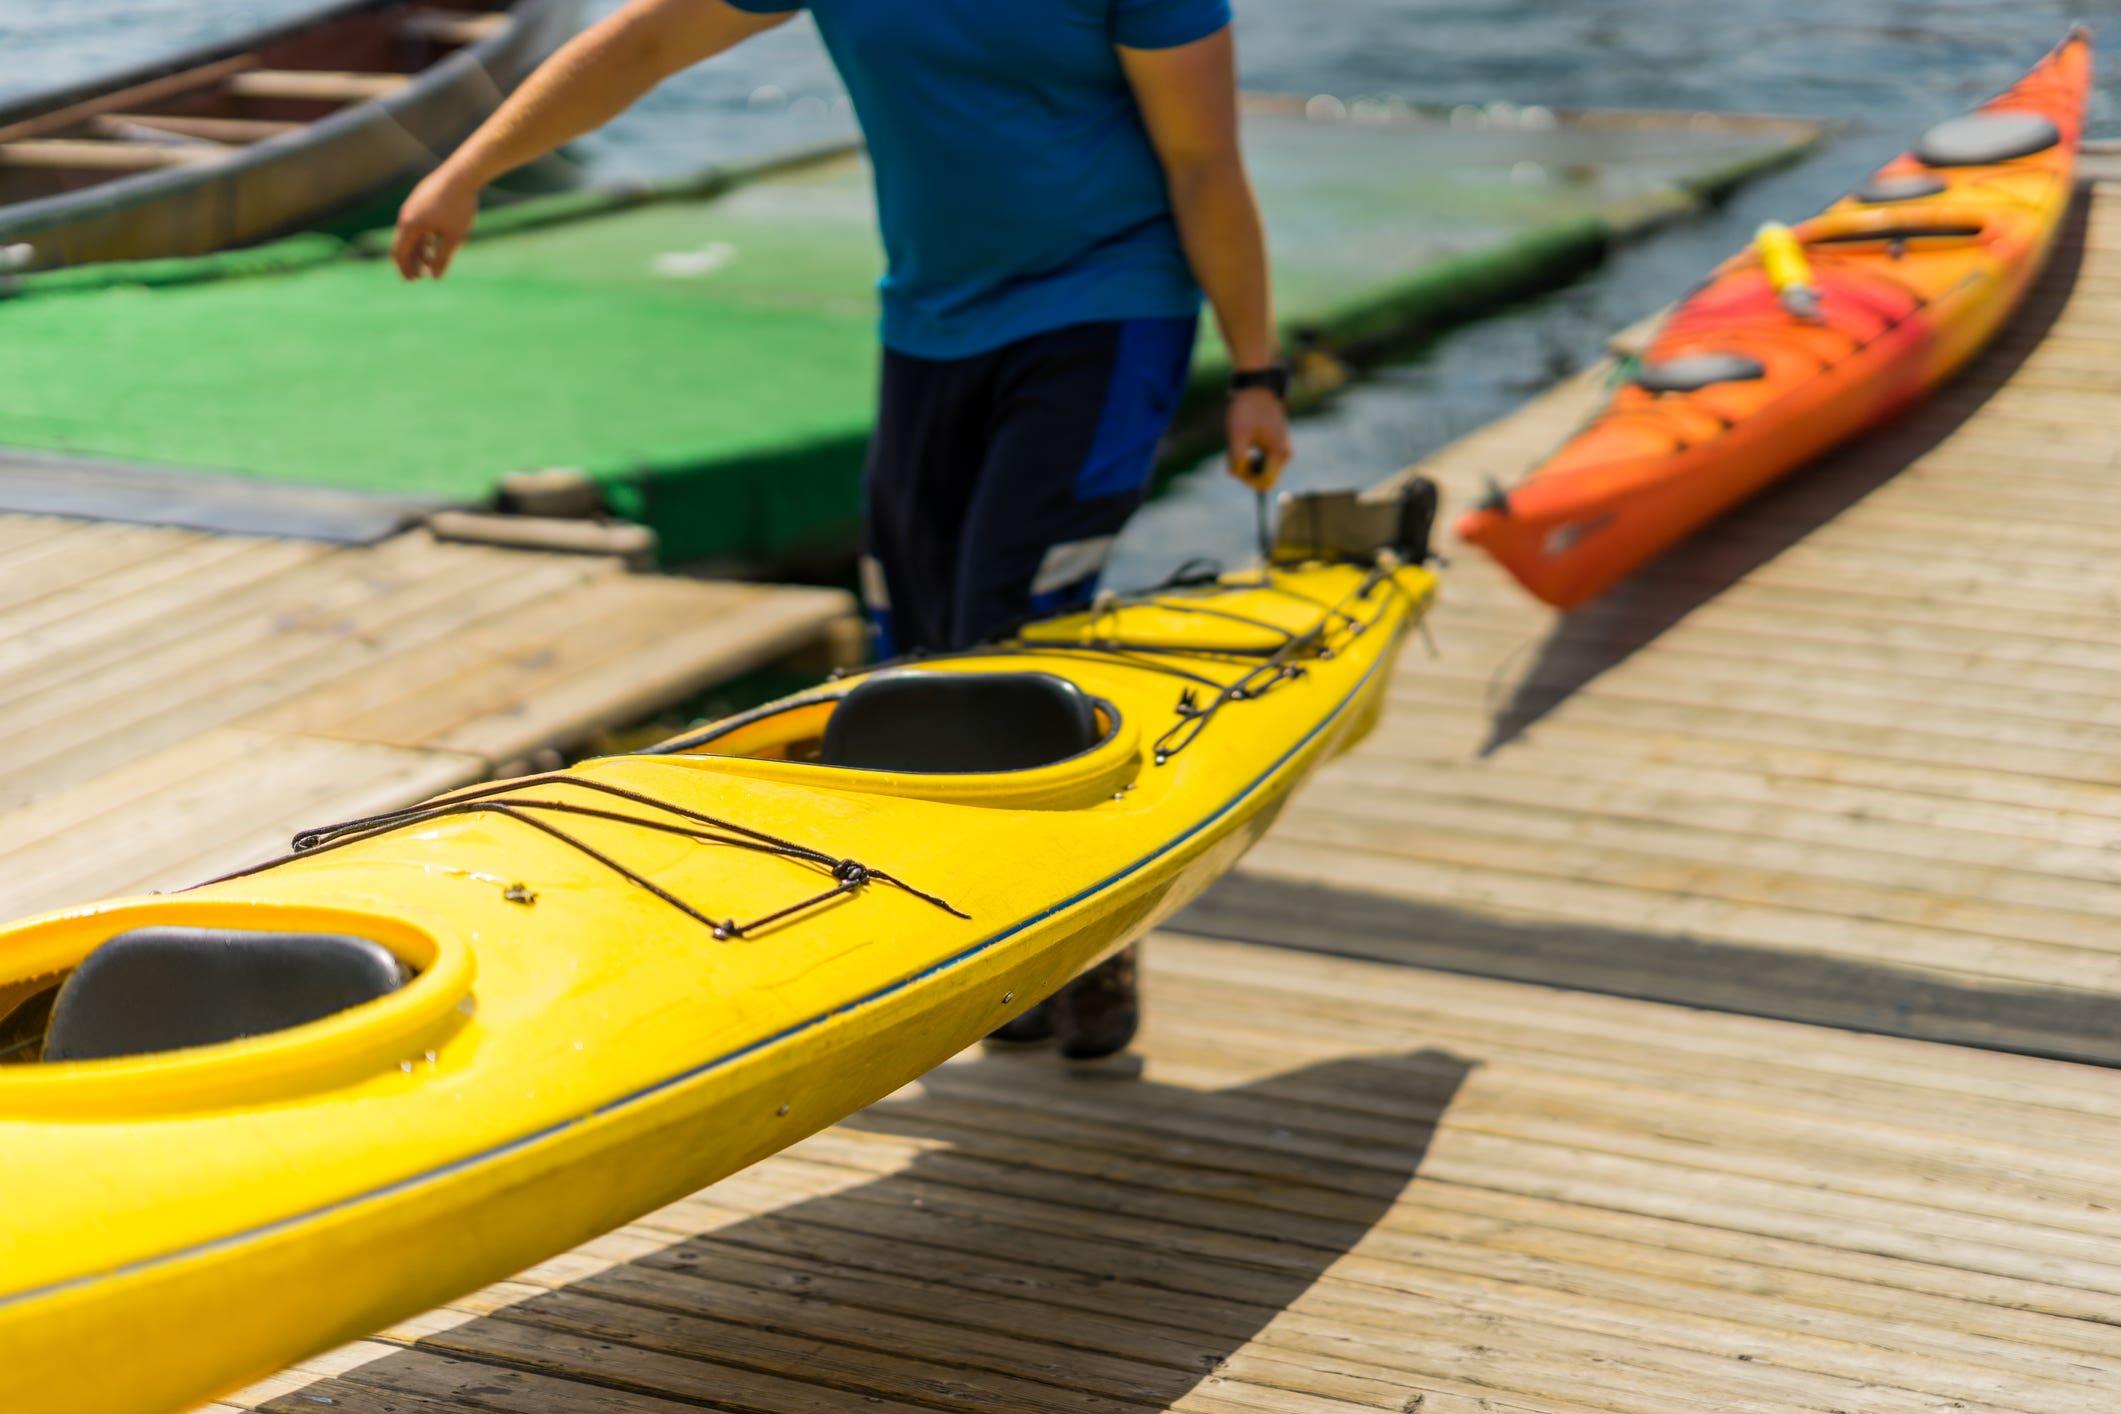 Fiberglass kayaks